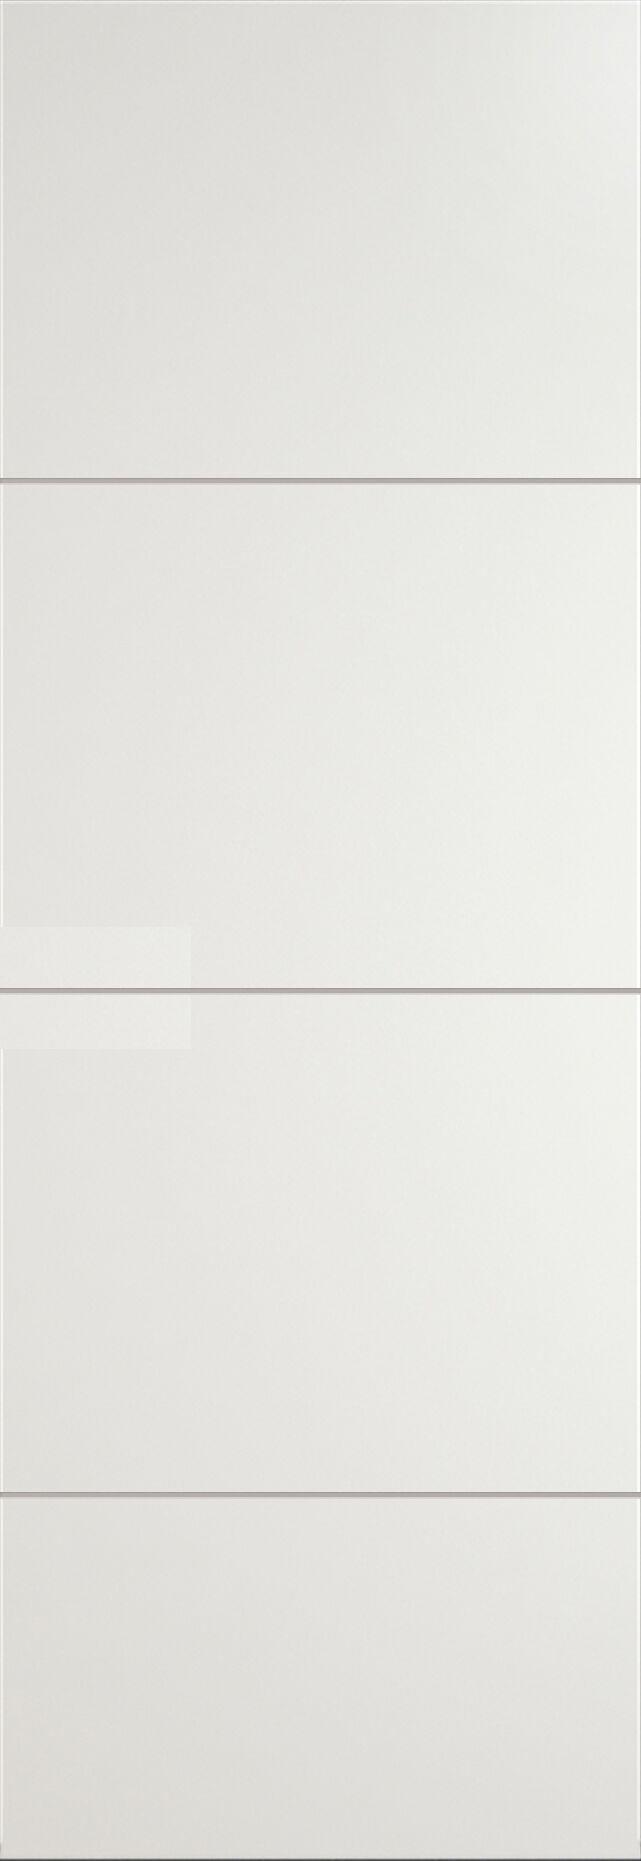 Tivoli Г-2 Invisible цвет - Бежевая эмаль Без стекла (ДГ)